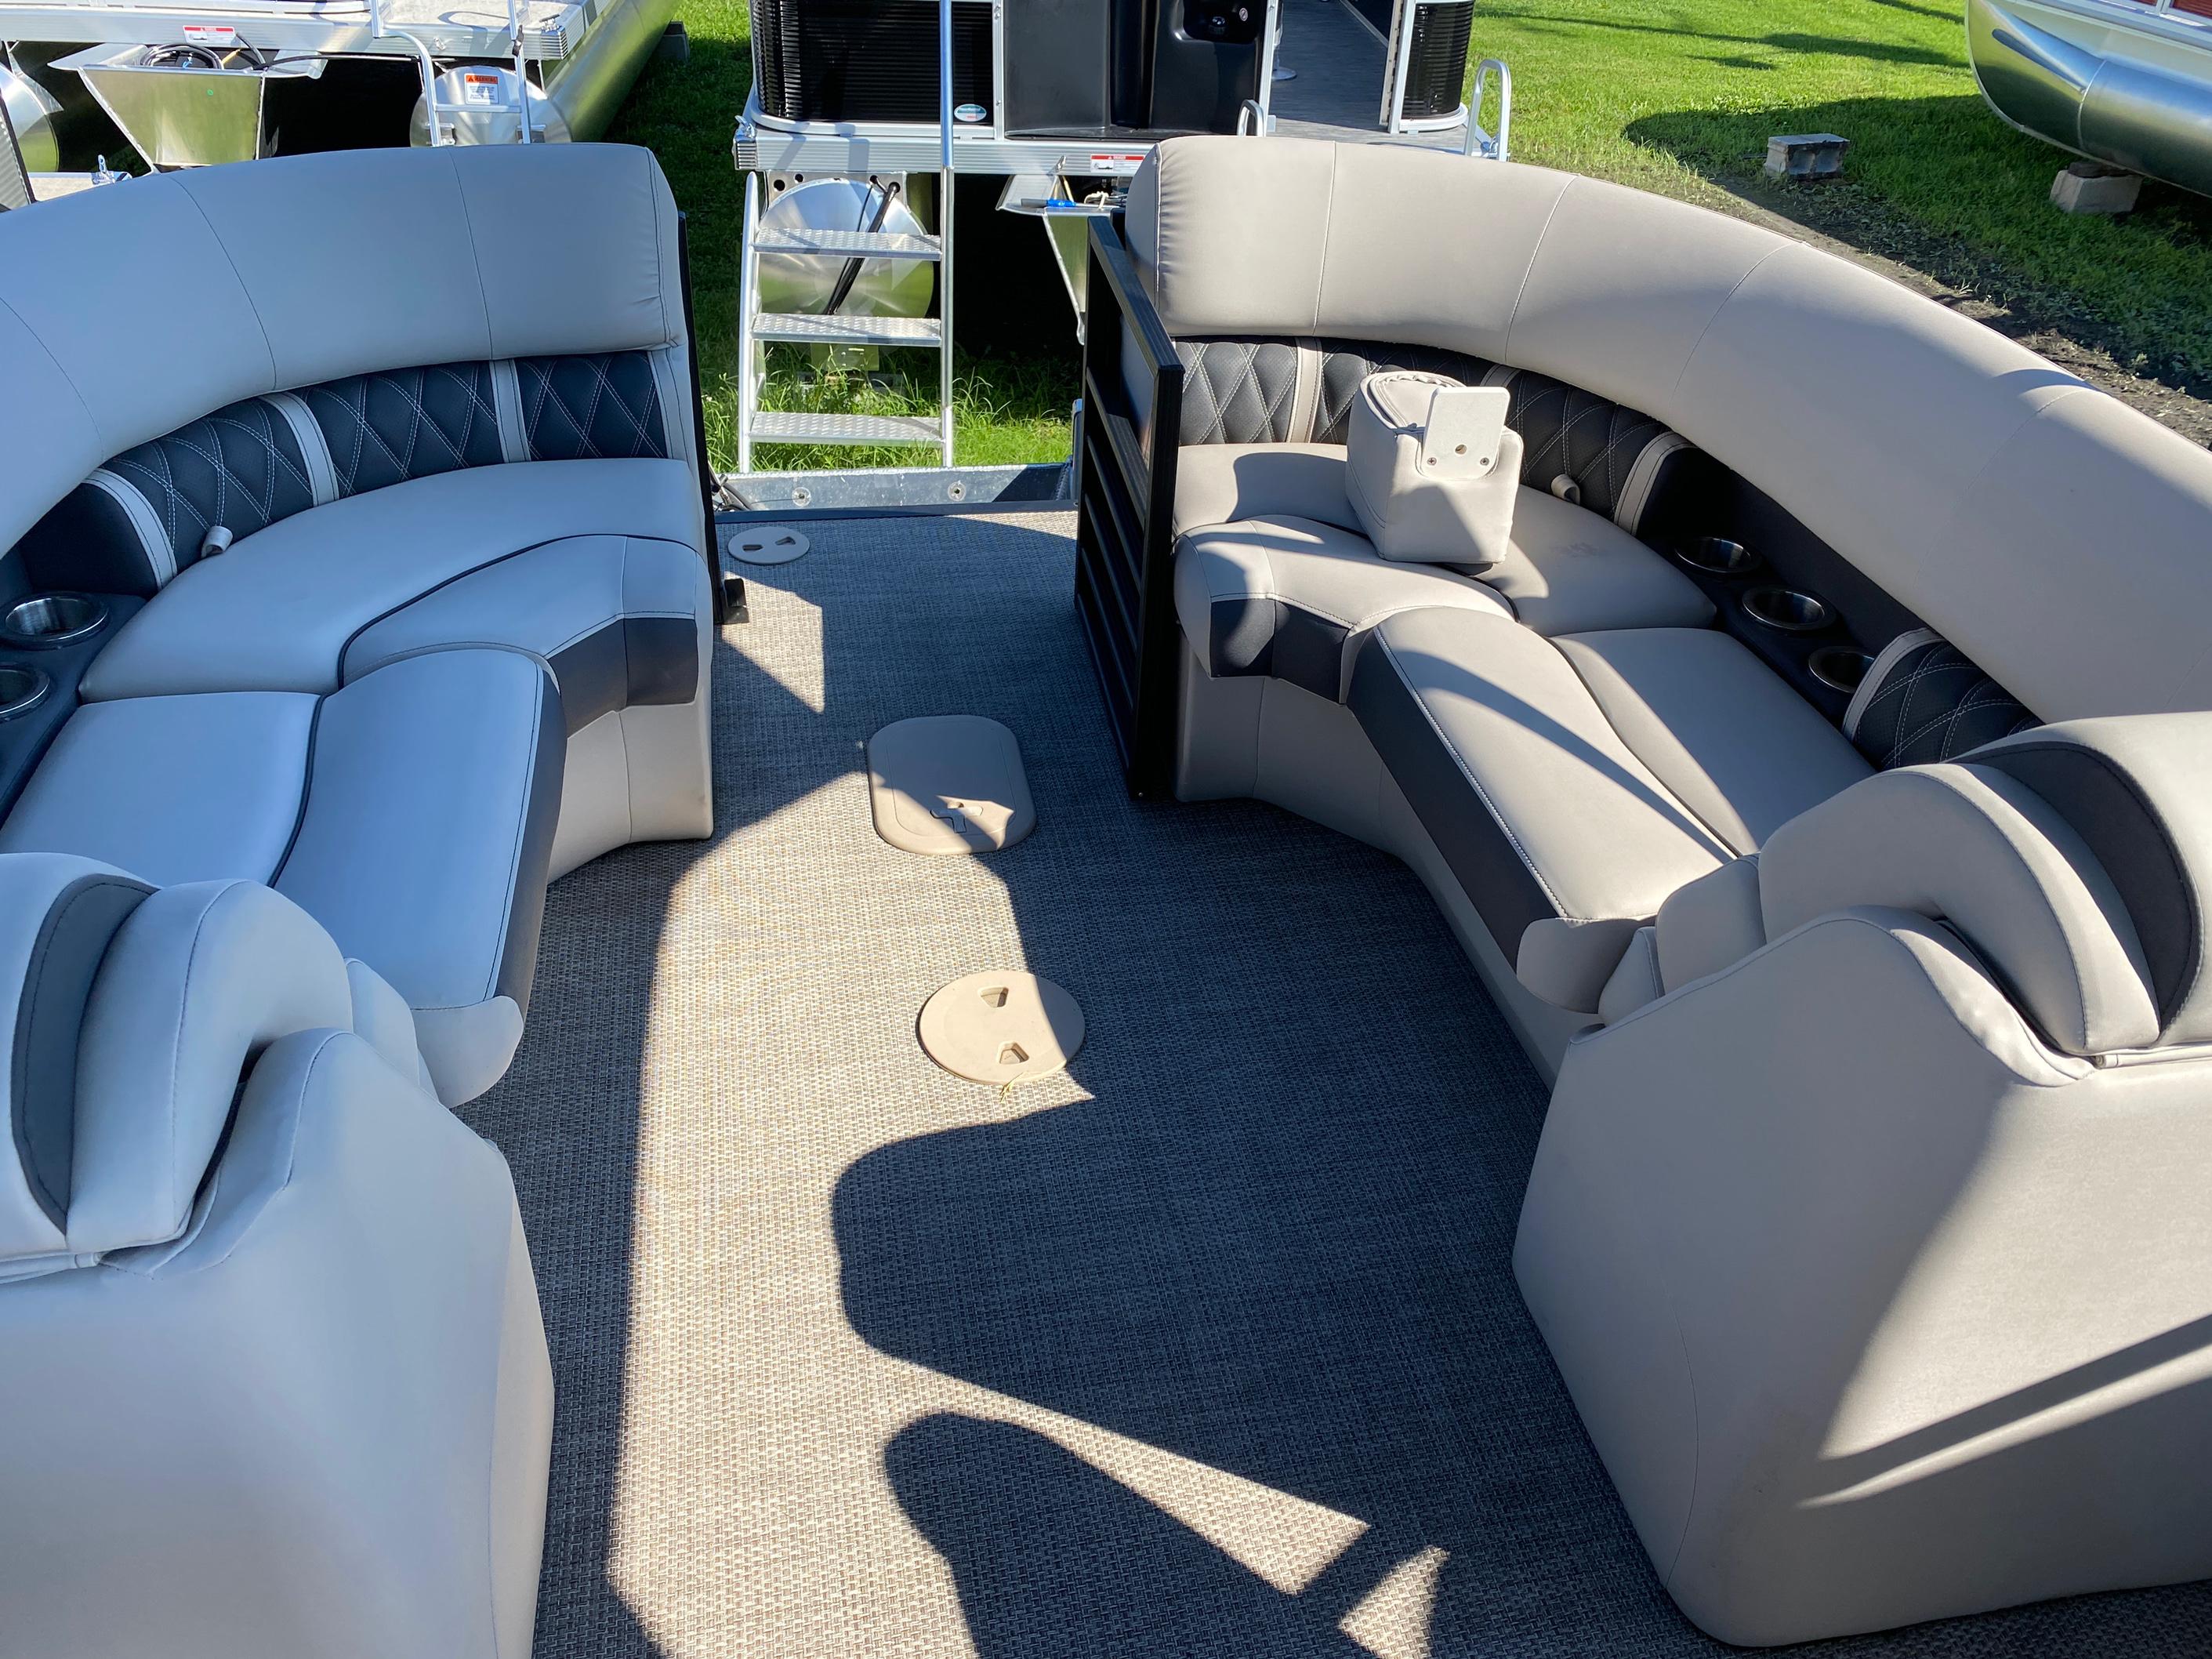 2019 Bennington boat for sale, model of the boat is 23 GSR & Image # 2 of 3